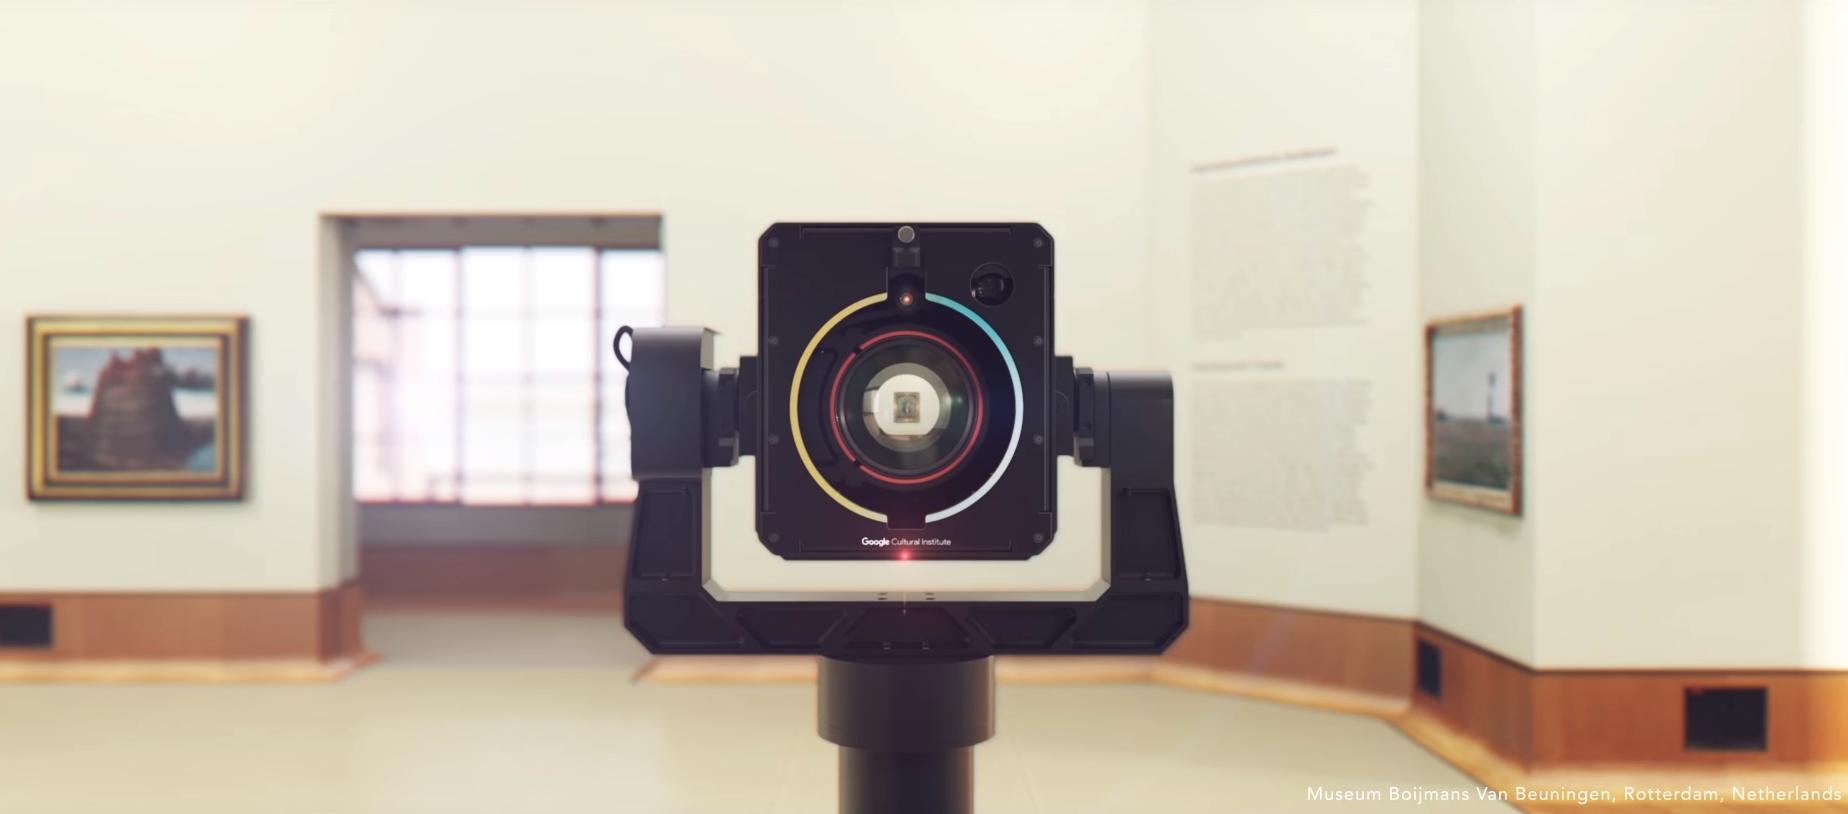 The Google Art Camera (screenshot via YouTube)